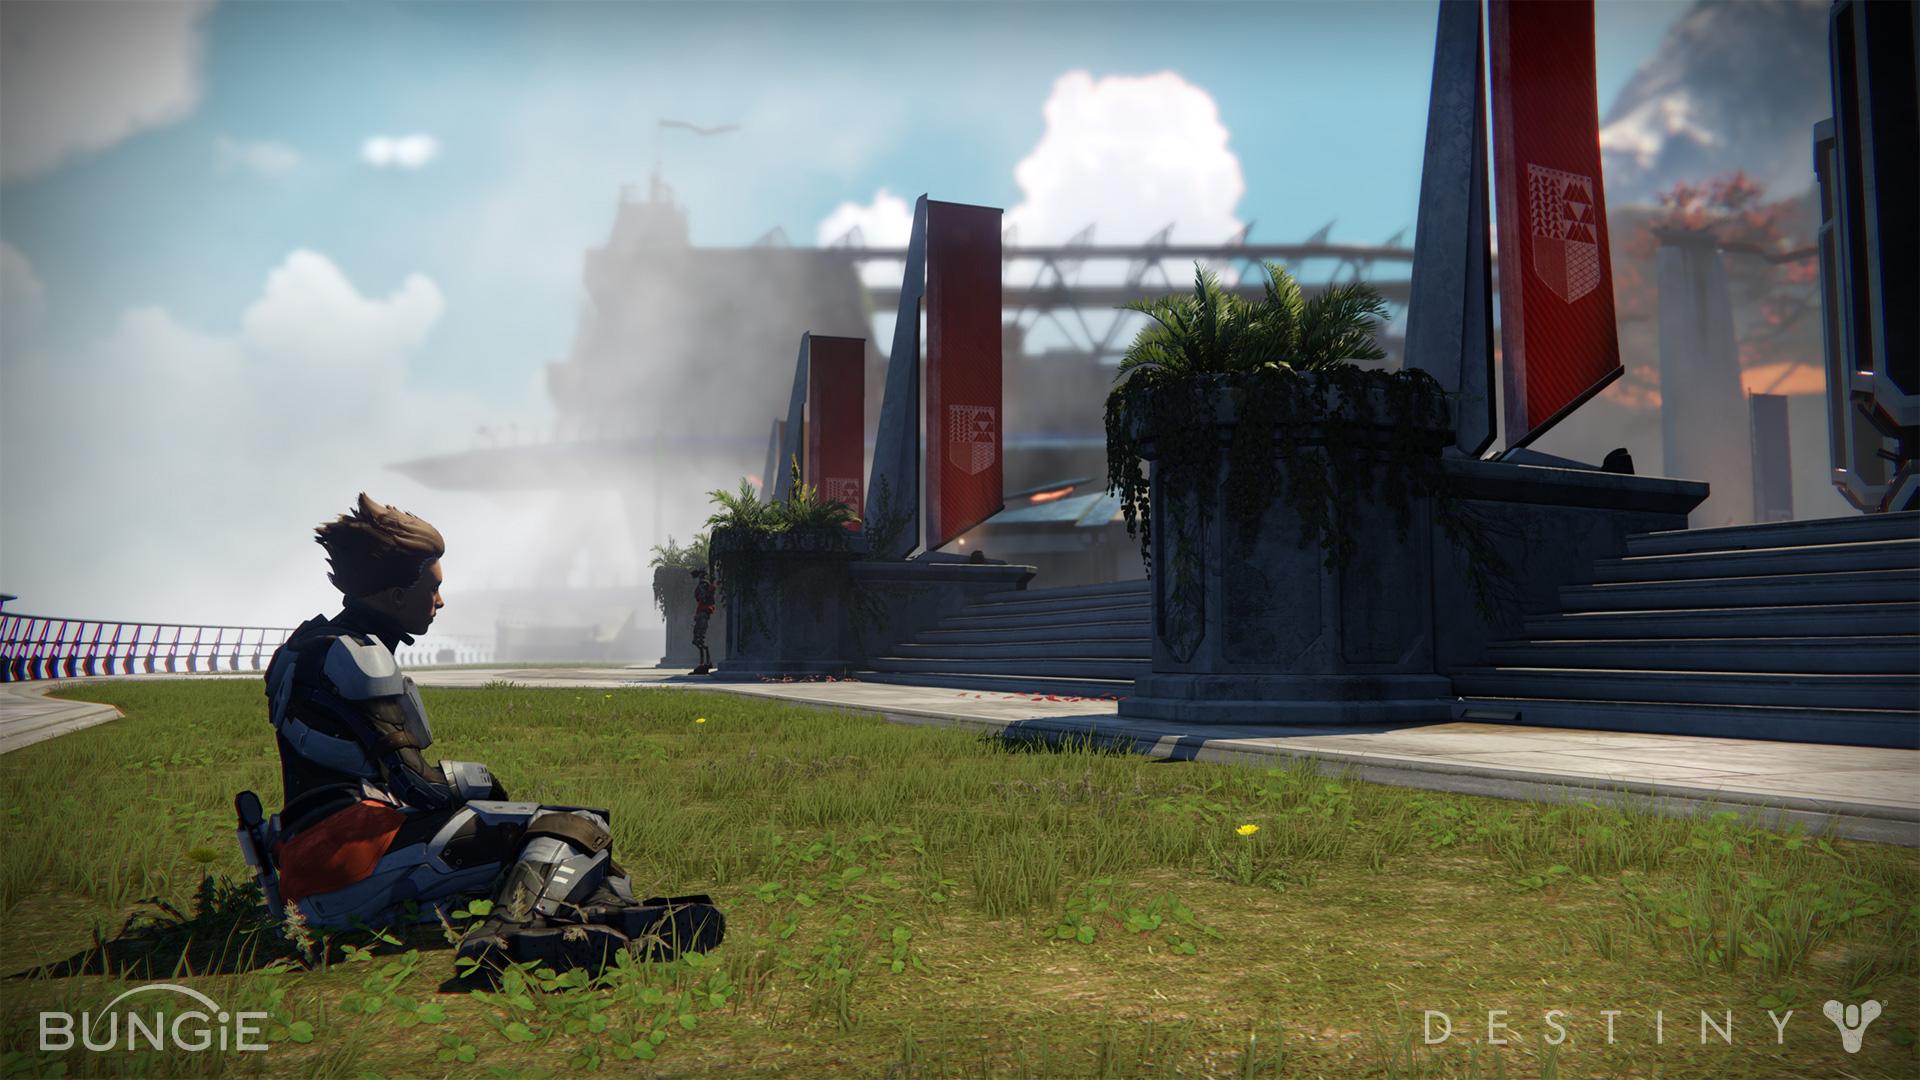 Destiny: Xur, Agent der Neun, Angebot und Position am 21.8.